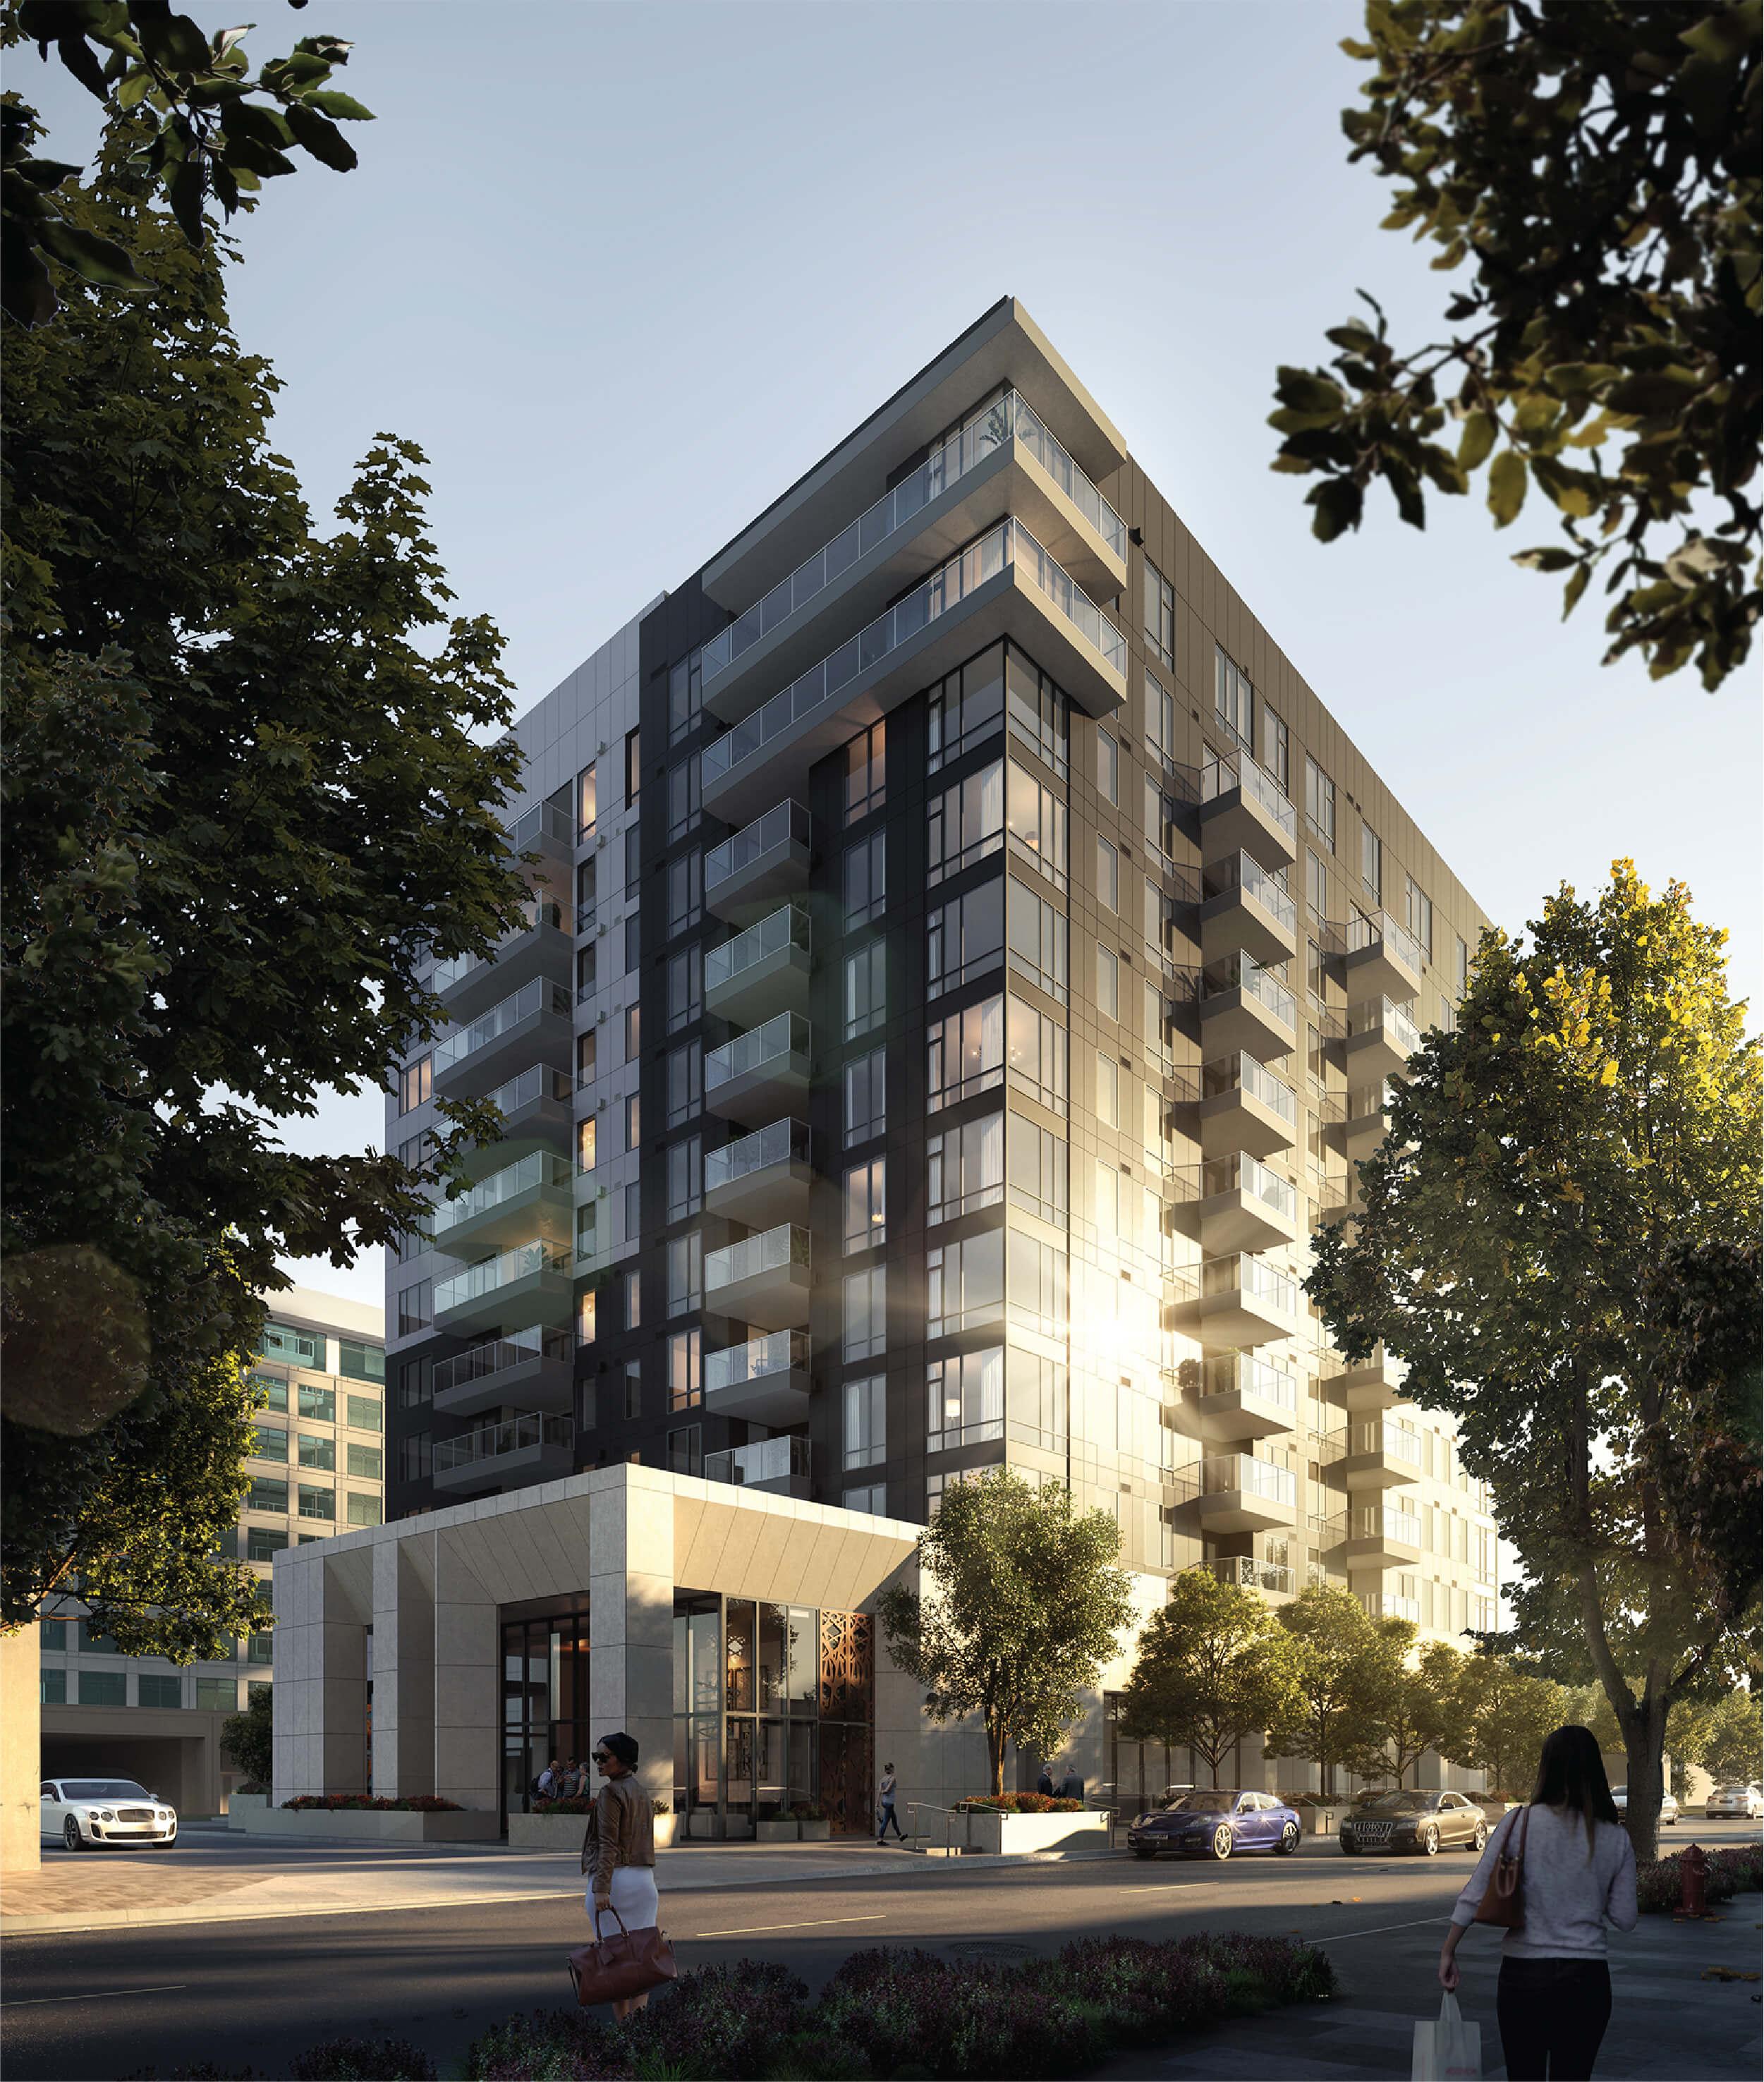 Princeton Court Apartments: Residential